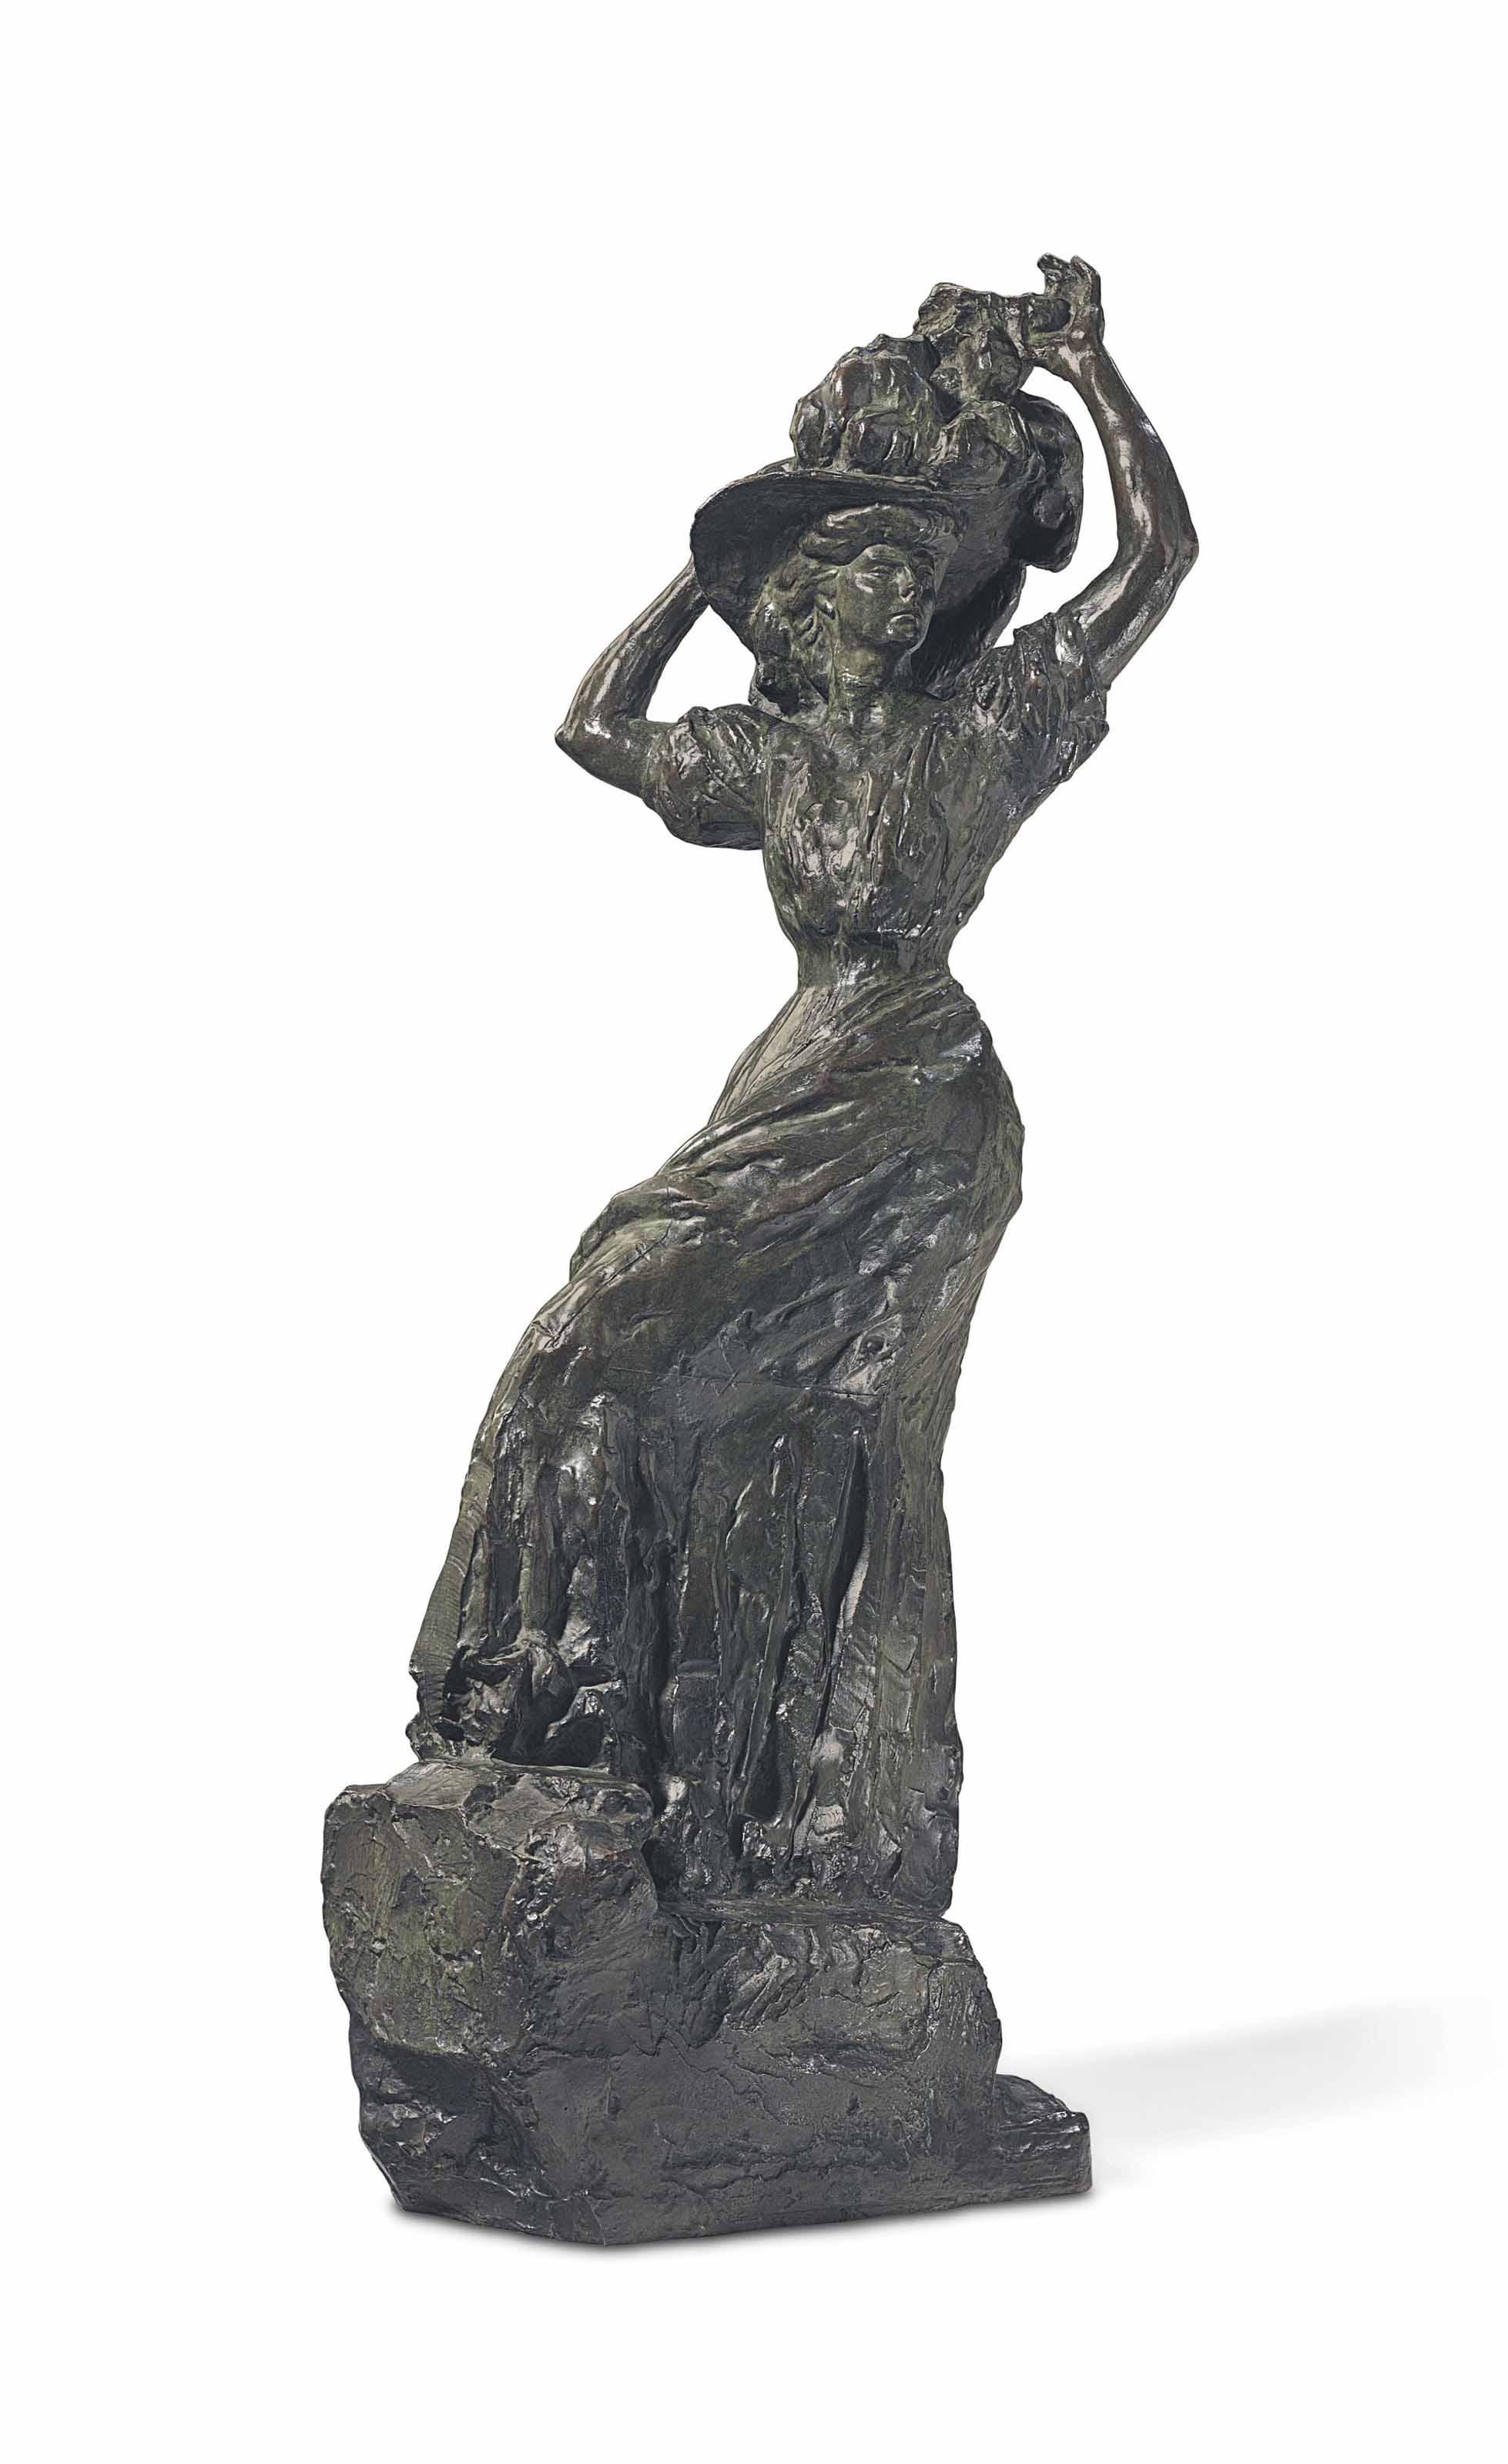 Augusta (La Parisienne)